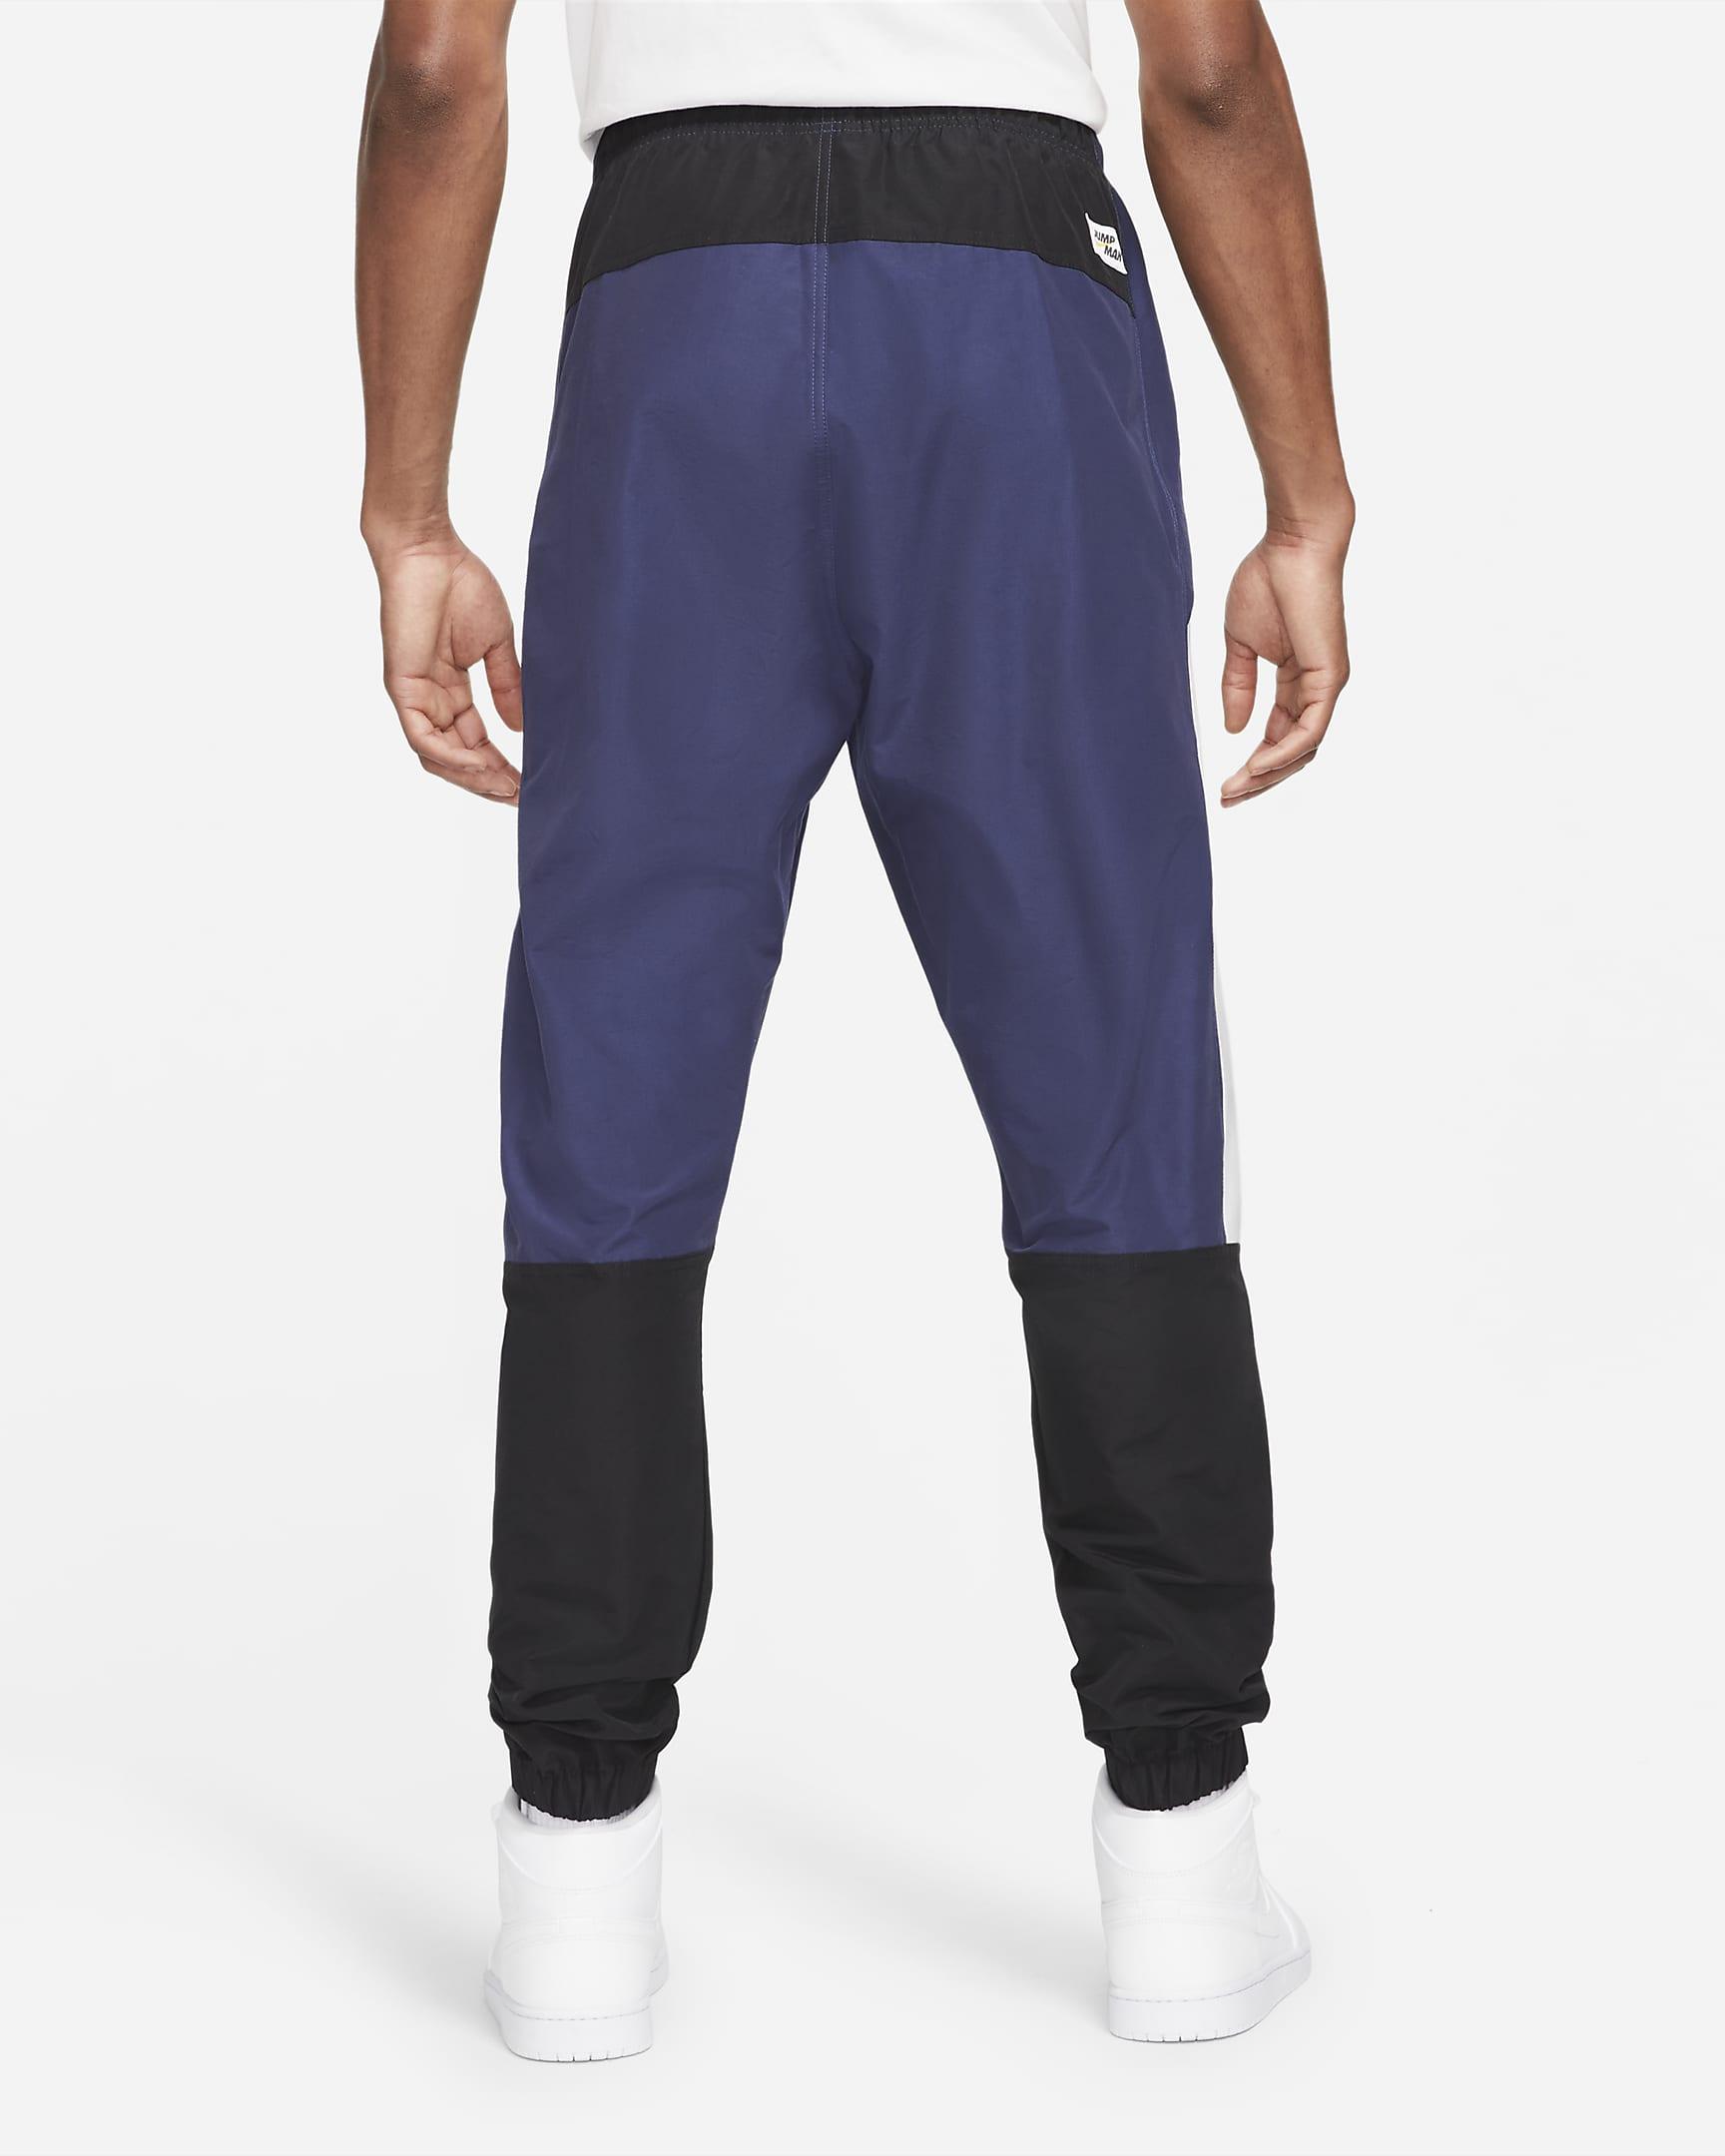 jordan-jumpman-mens-woven-pants-4BkNRR-1.png